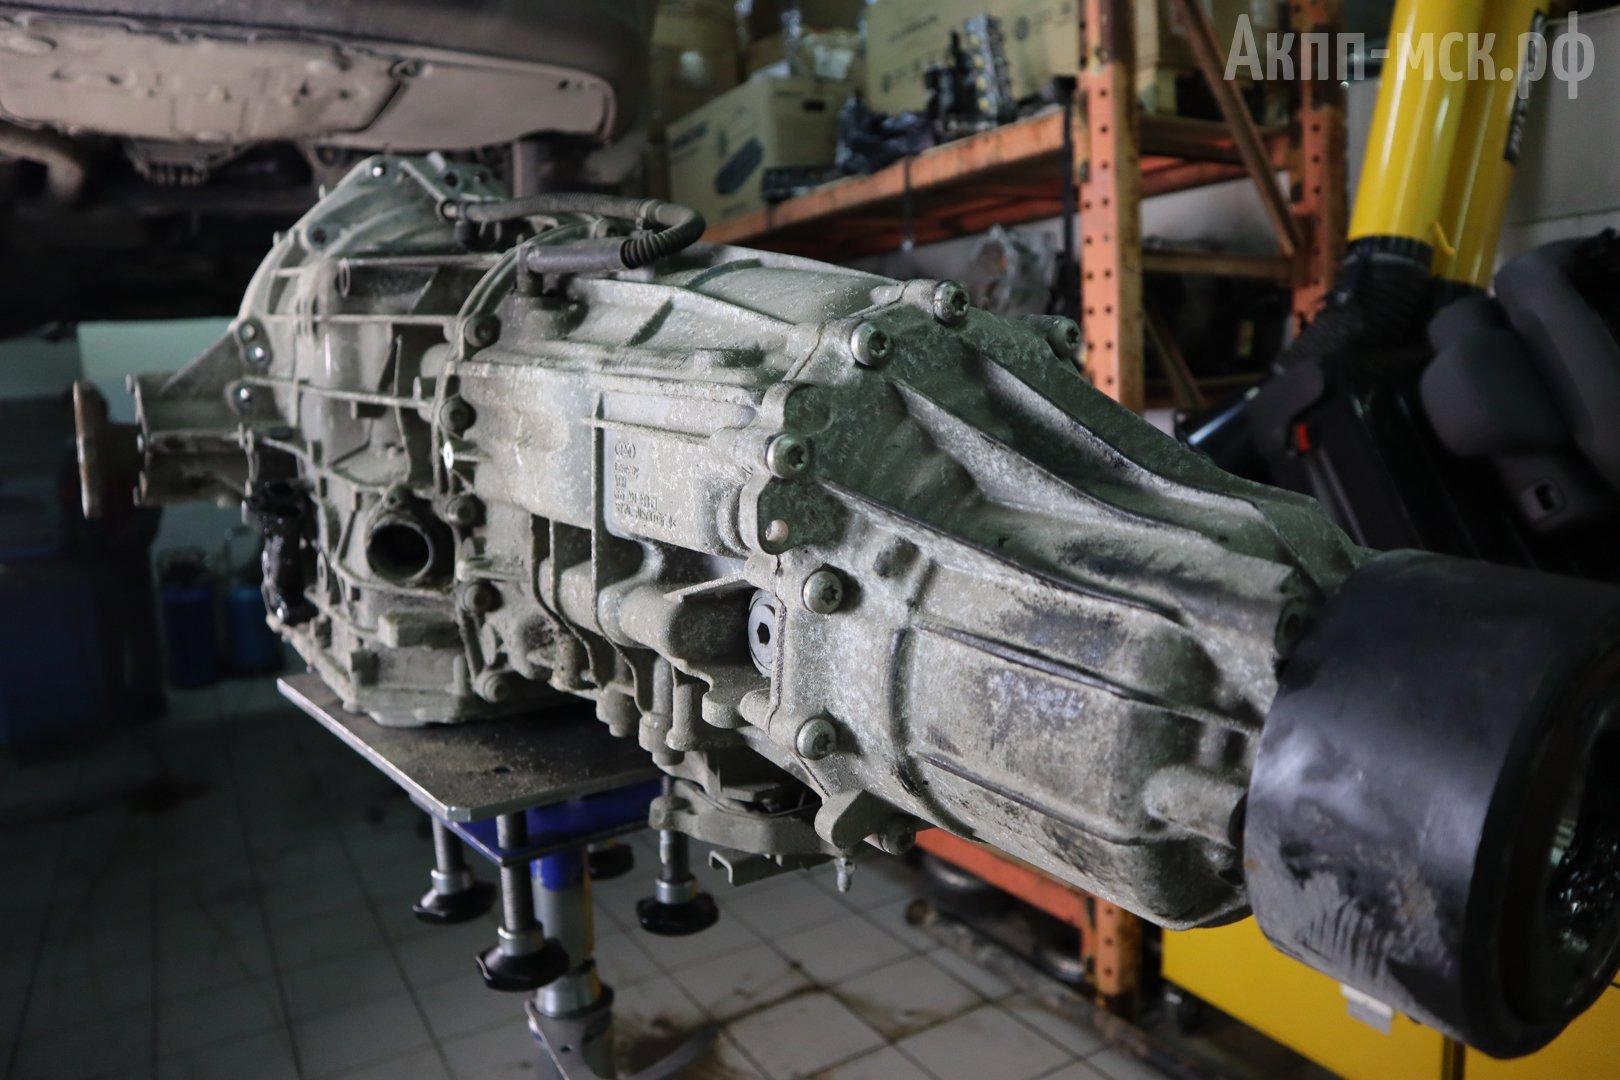 АКПП Audi A5 DSG7 0B5 DL501 S-Tronic